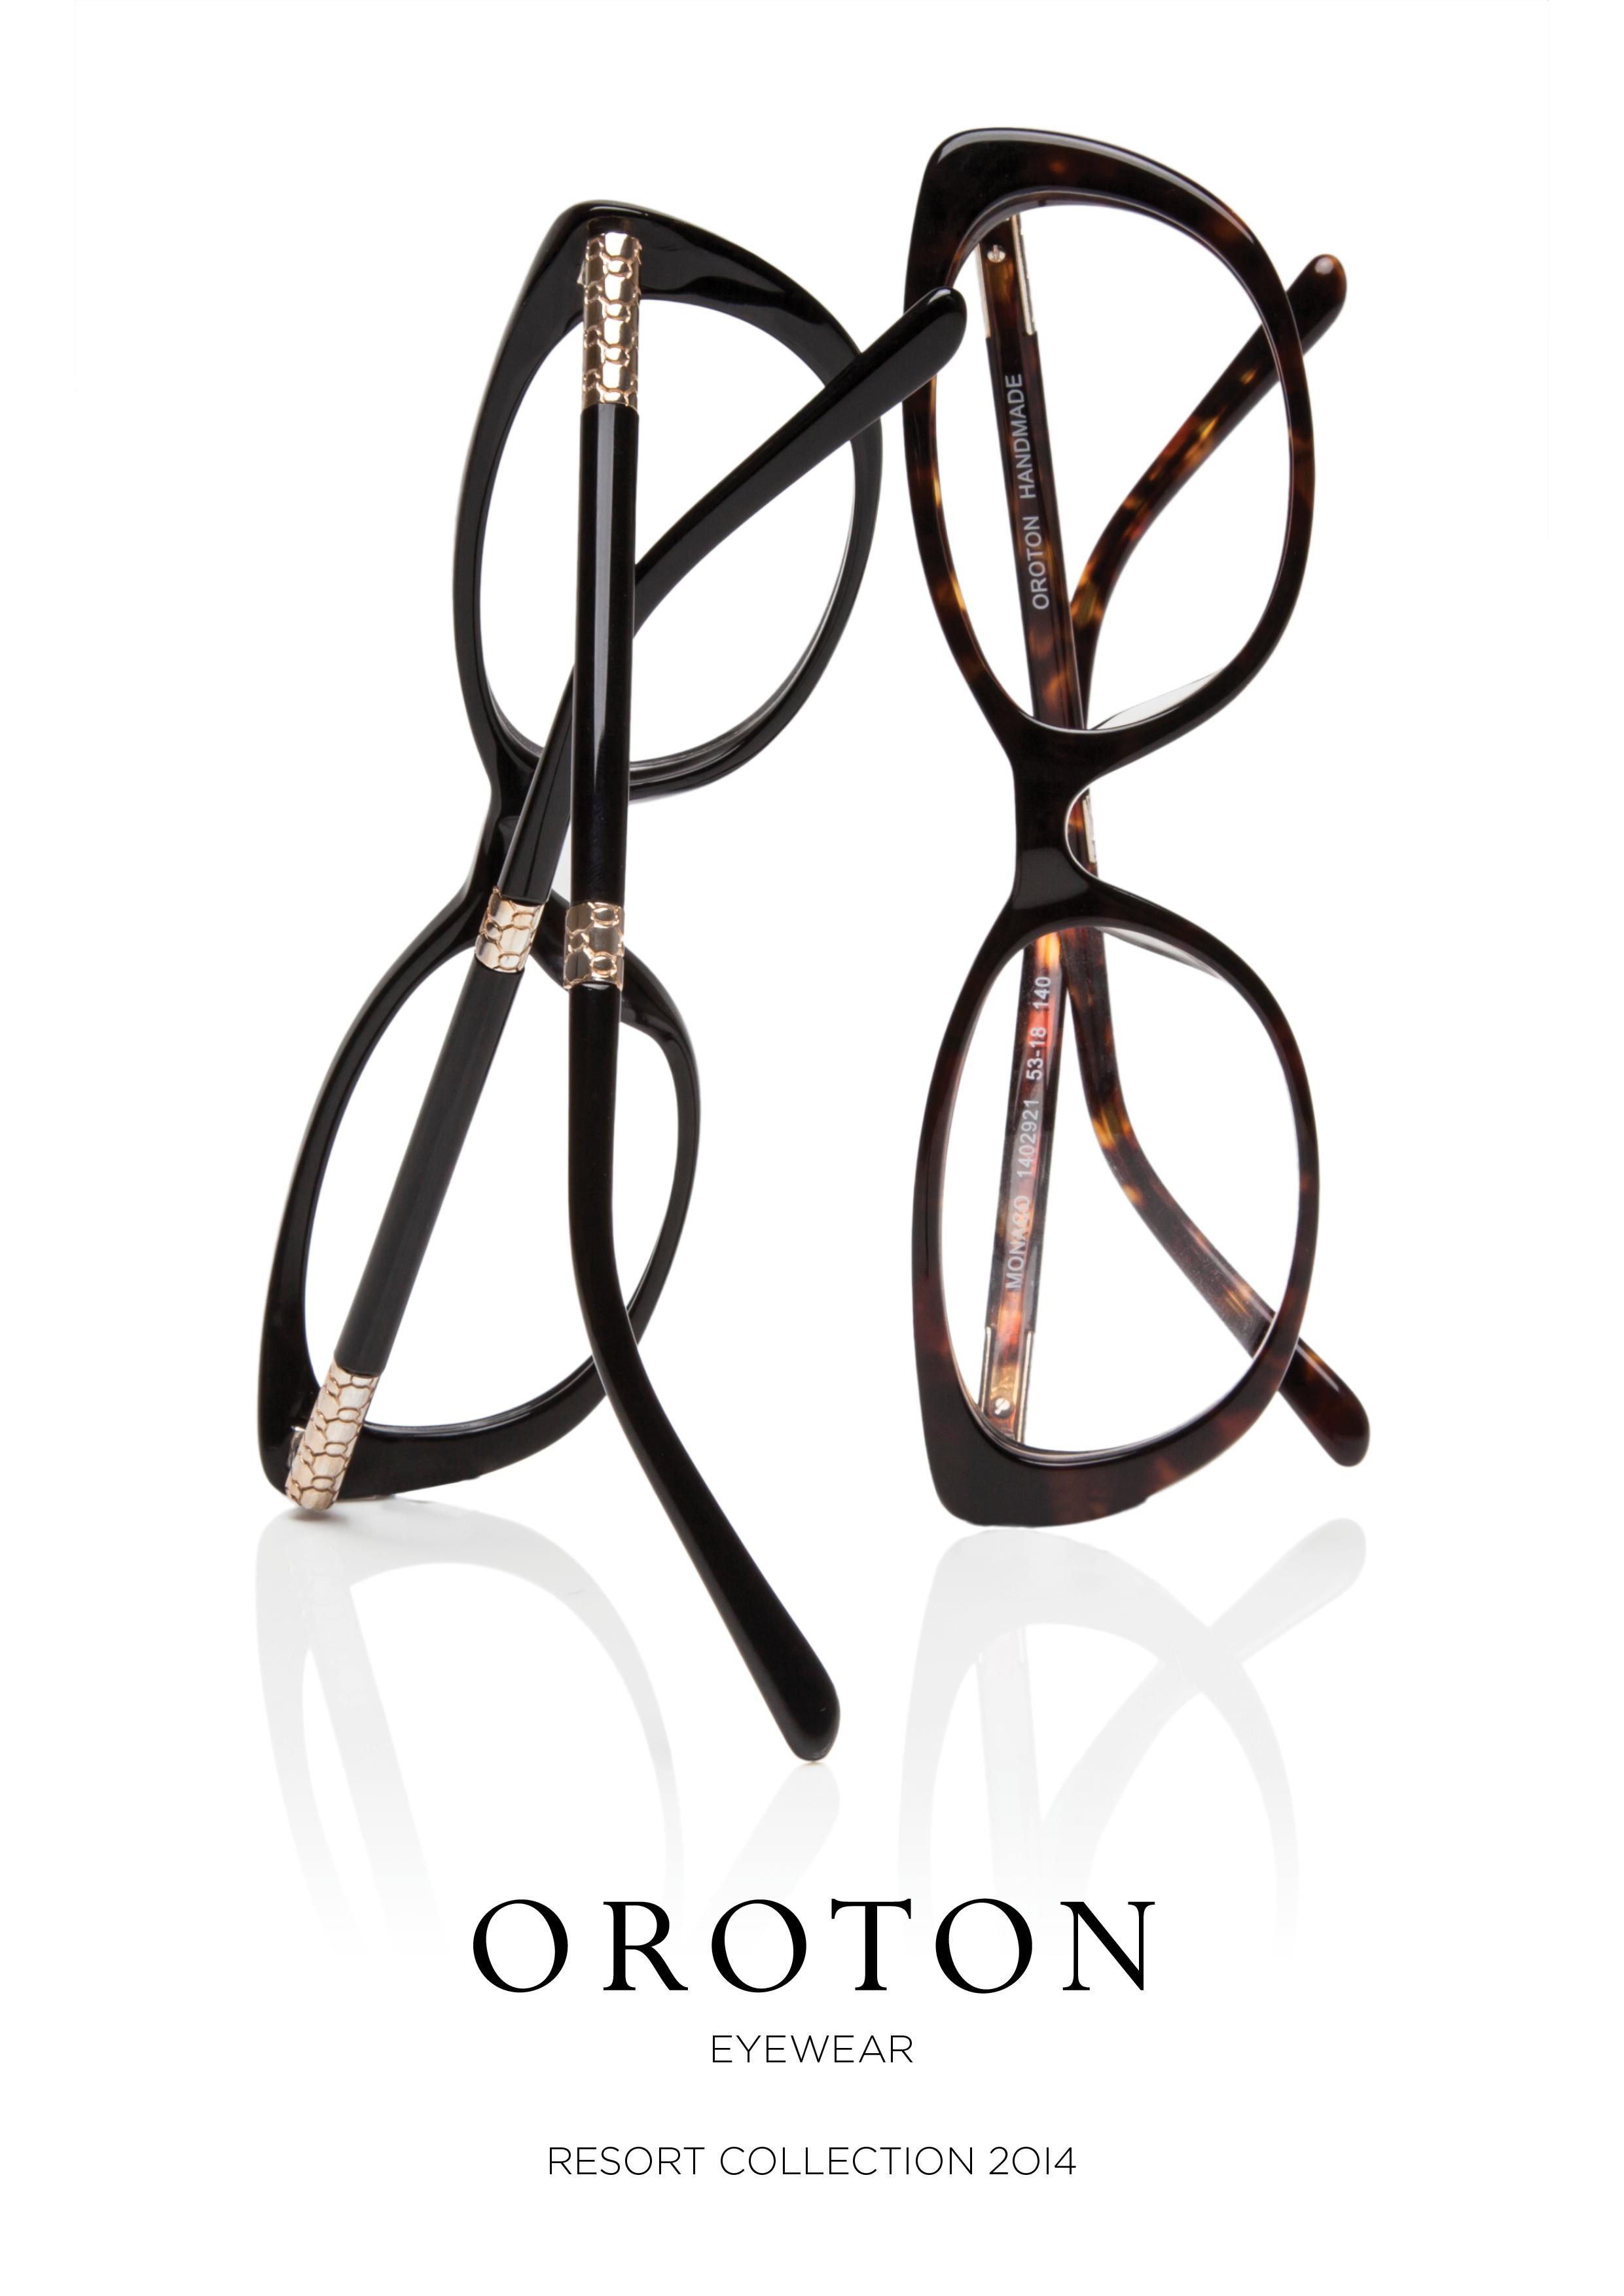 Oroton_season_preview_custom_pos_mock_up_2014_A4.jpg